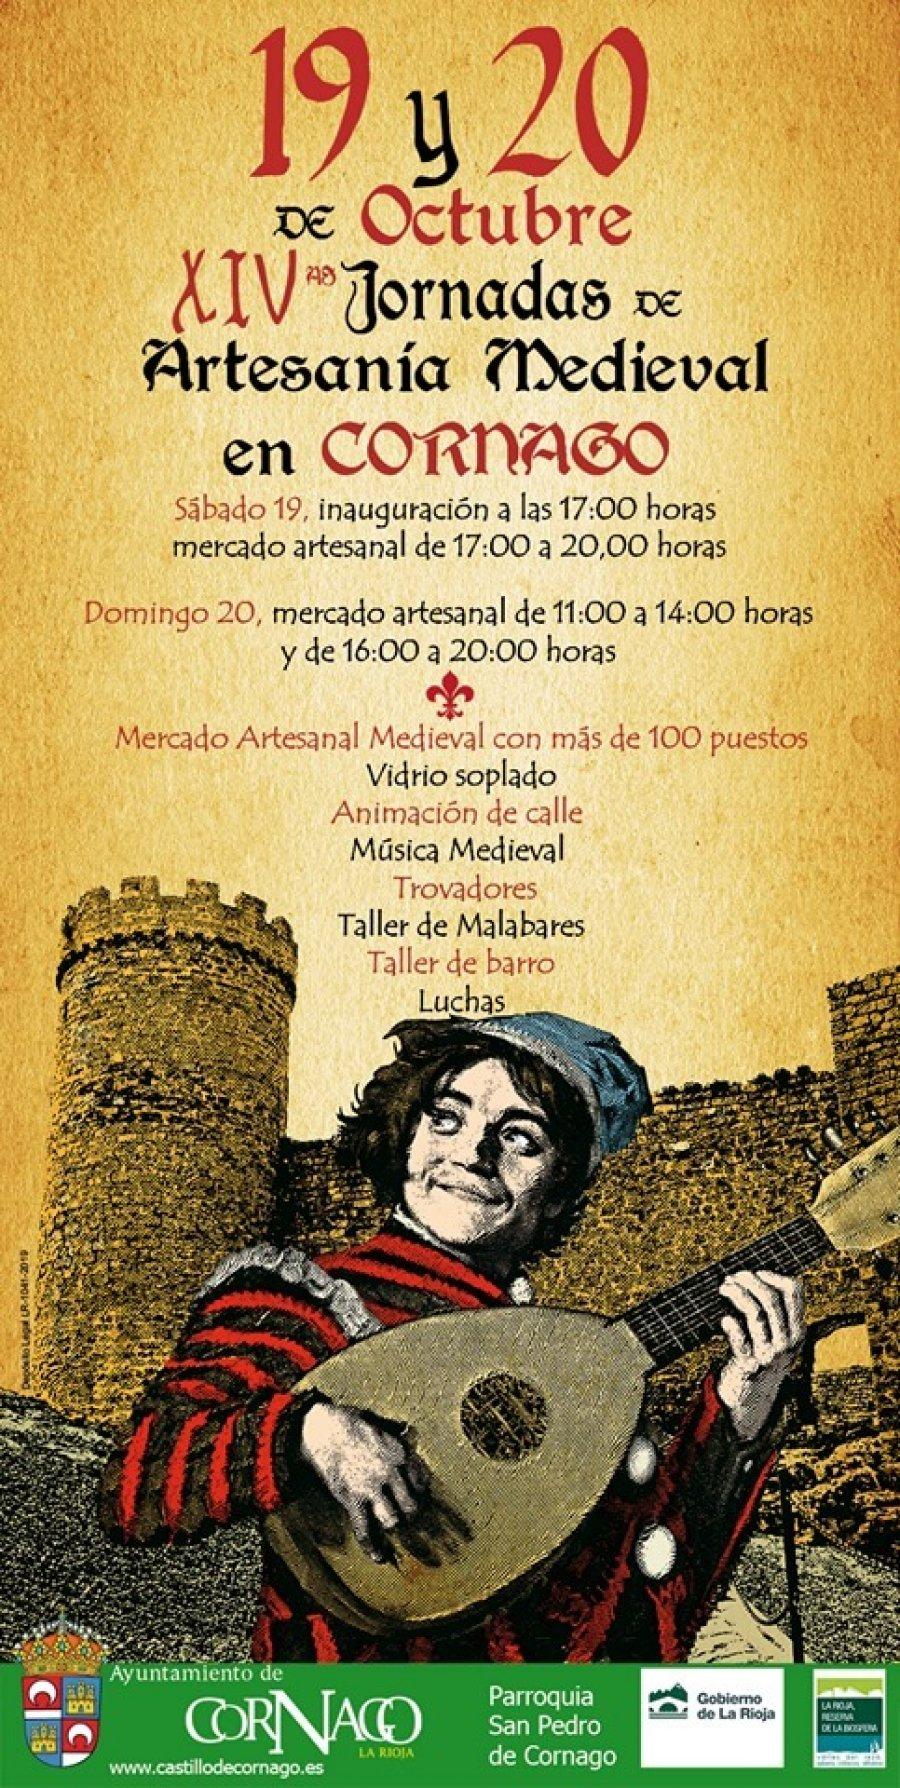 CORNAGO JORNADAS ARTESANIA MEDIEVAL 2019